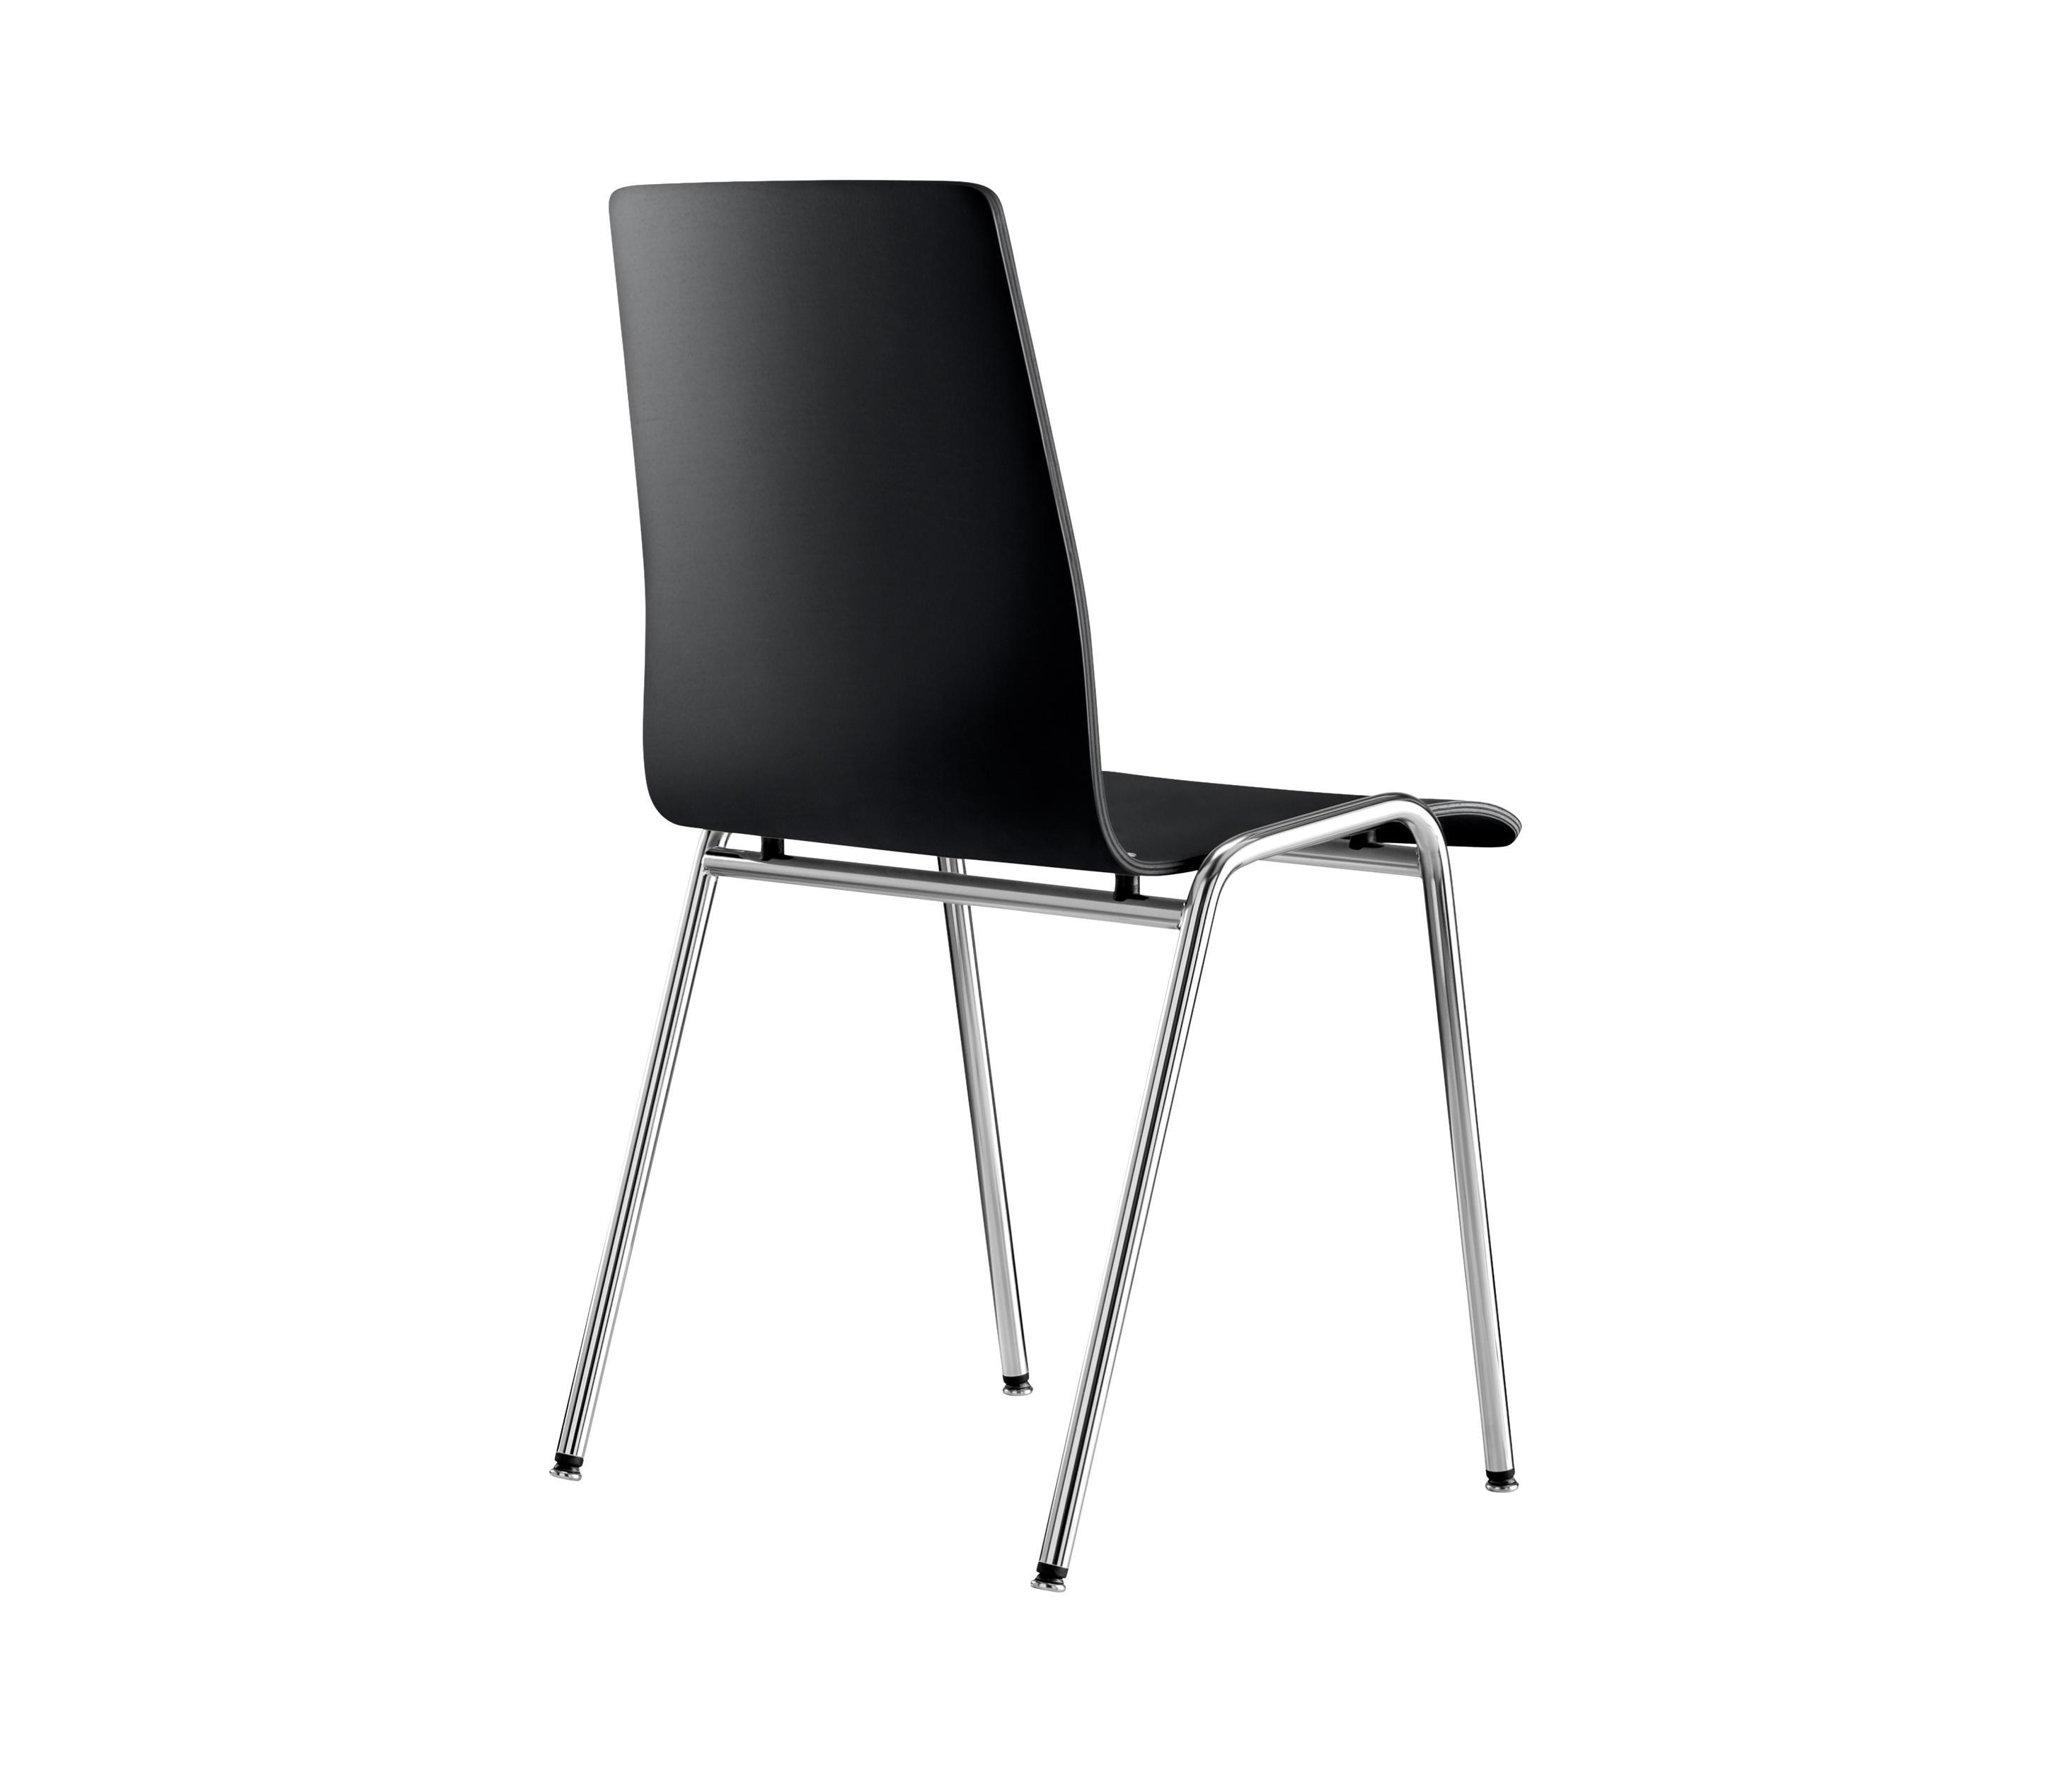 PLENUM 8-320 - Chairs from horgenglarus | Architonic